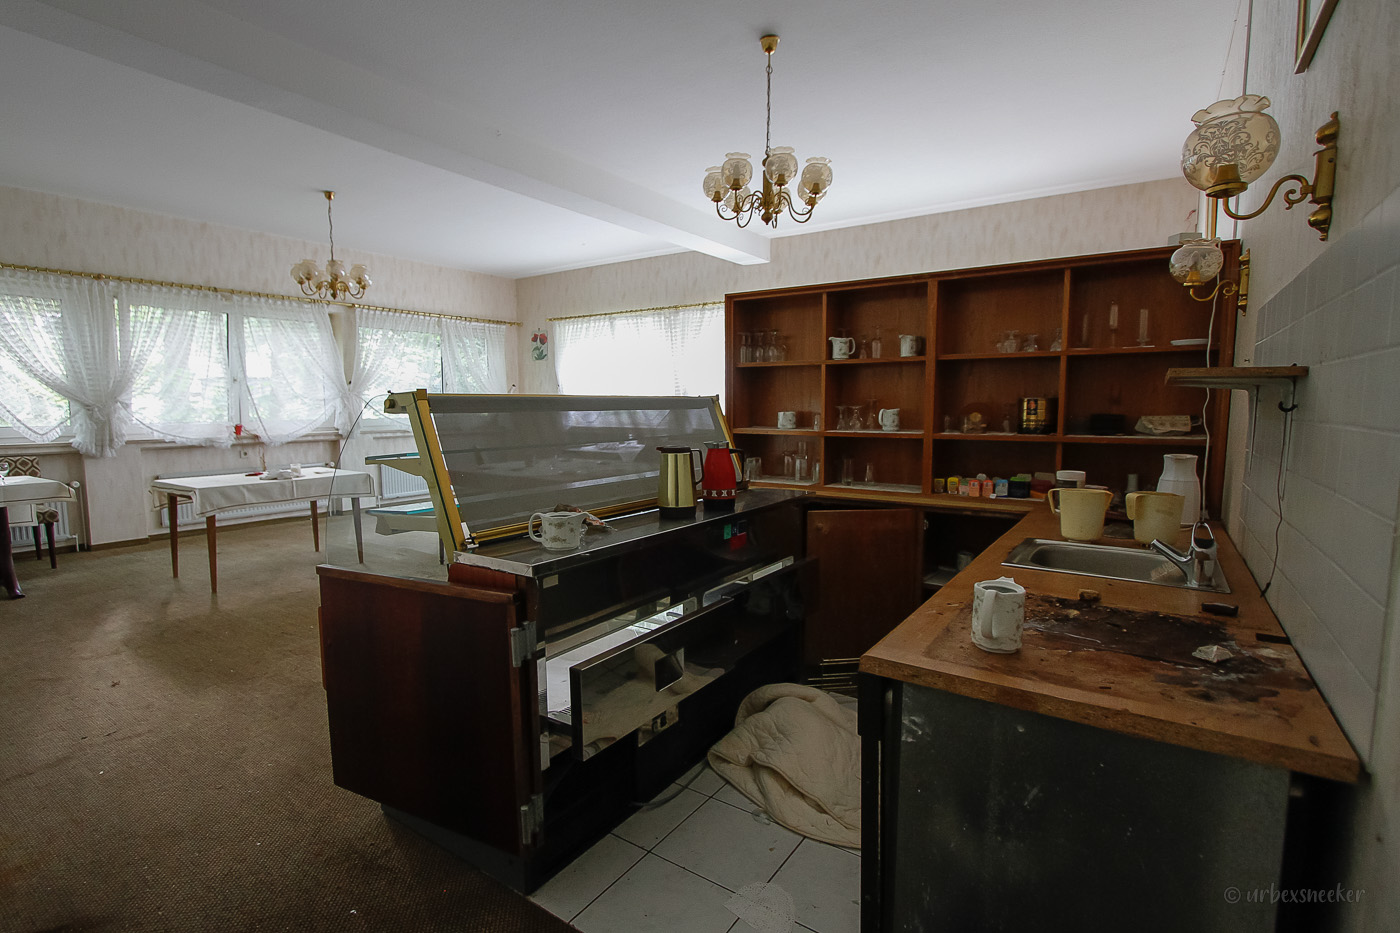 verlassenes Rehbock-Hotel Frühstücksraum 6130